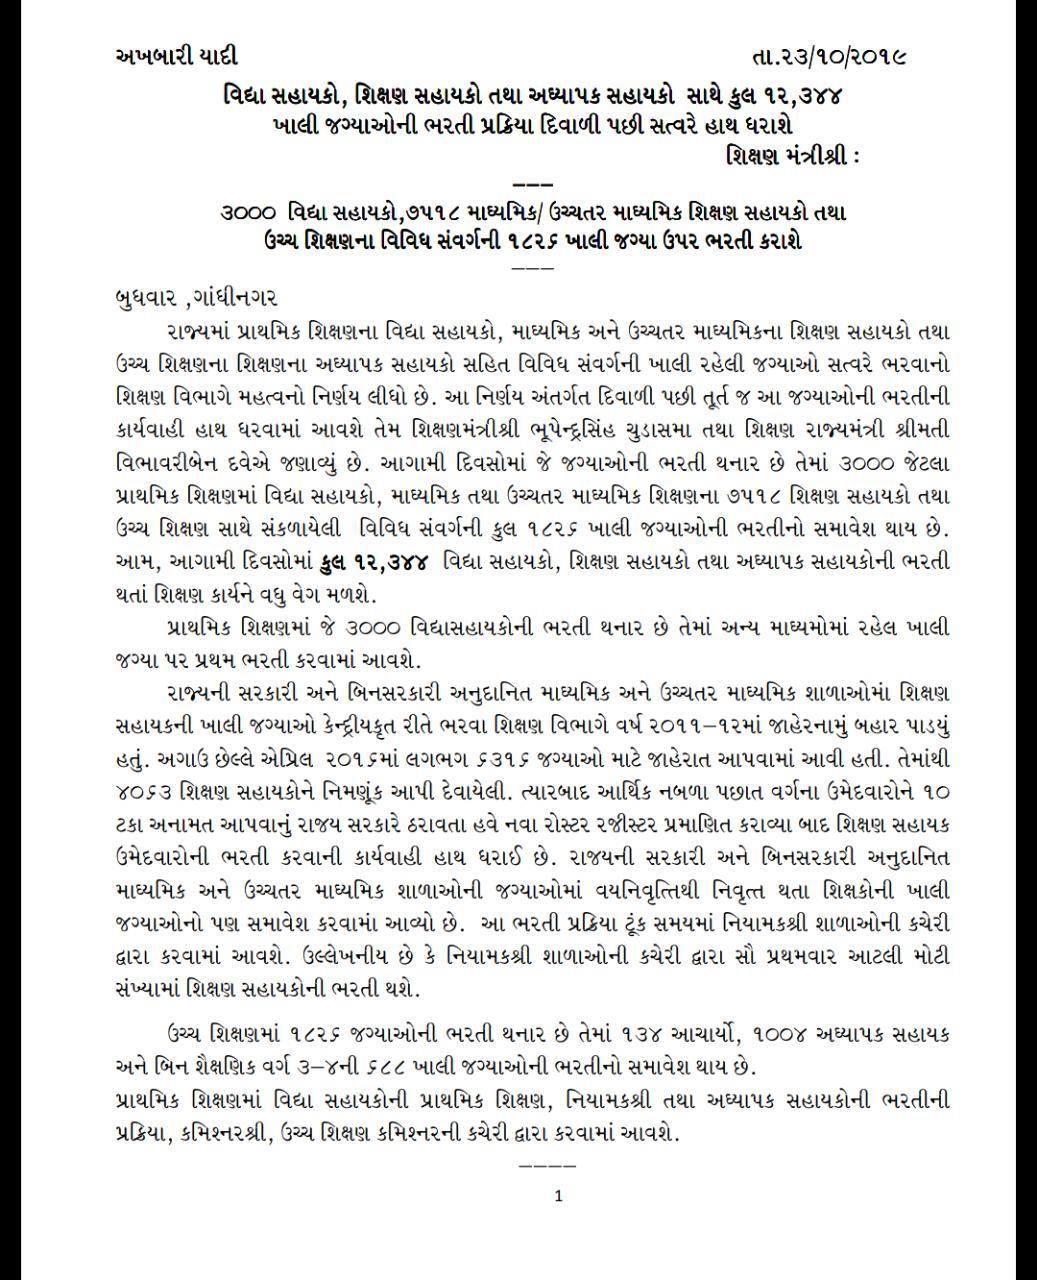 TAT BHARTI Shixan Sahayak Bharti 2019